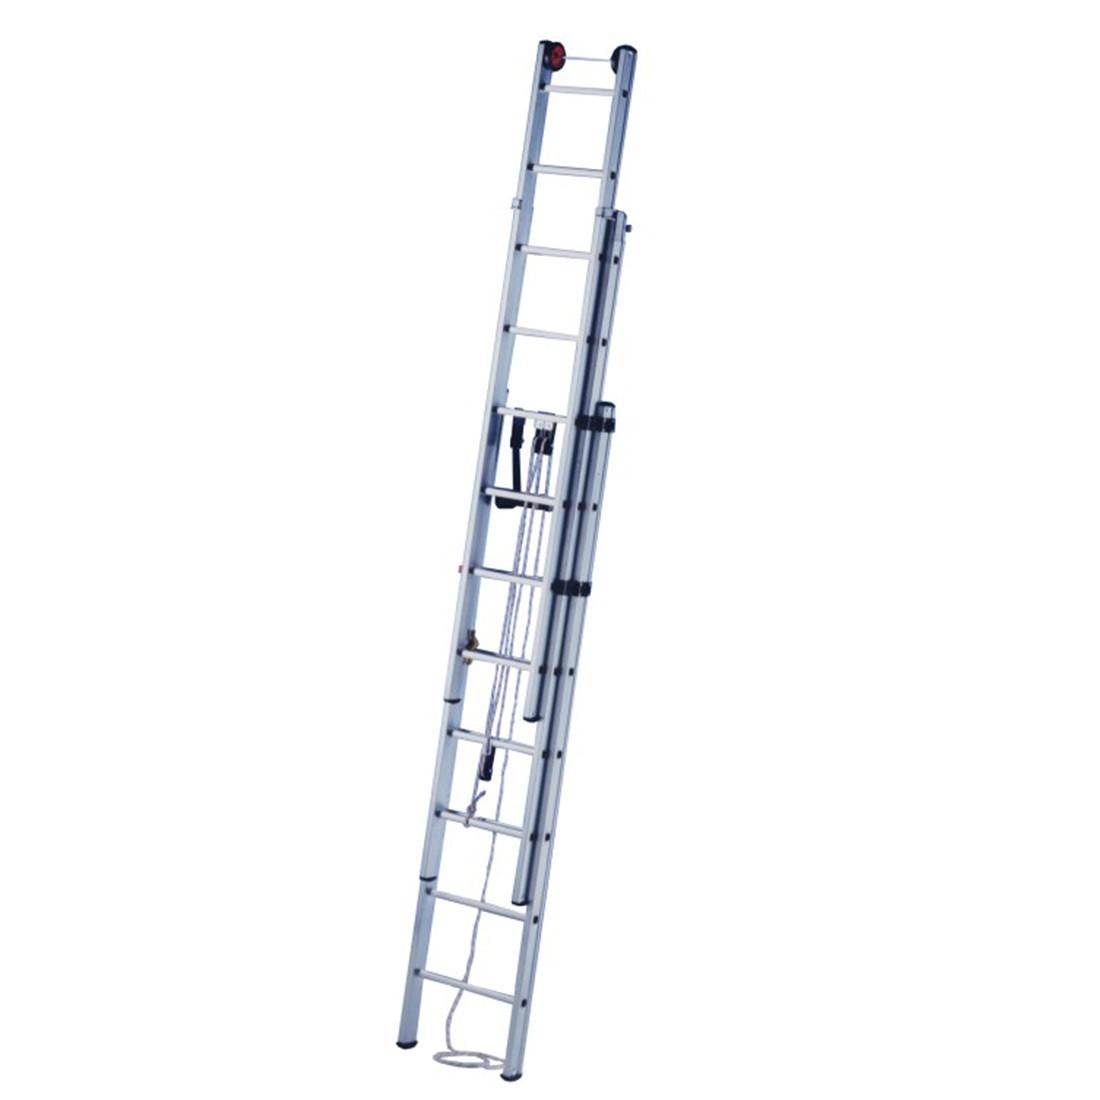 Alquiler de escalera extensible 3 tramos 12 50m maquinas for Escaleras extensibles